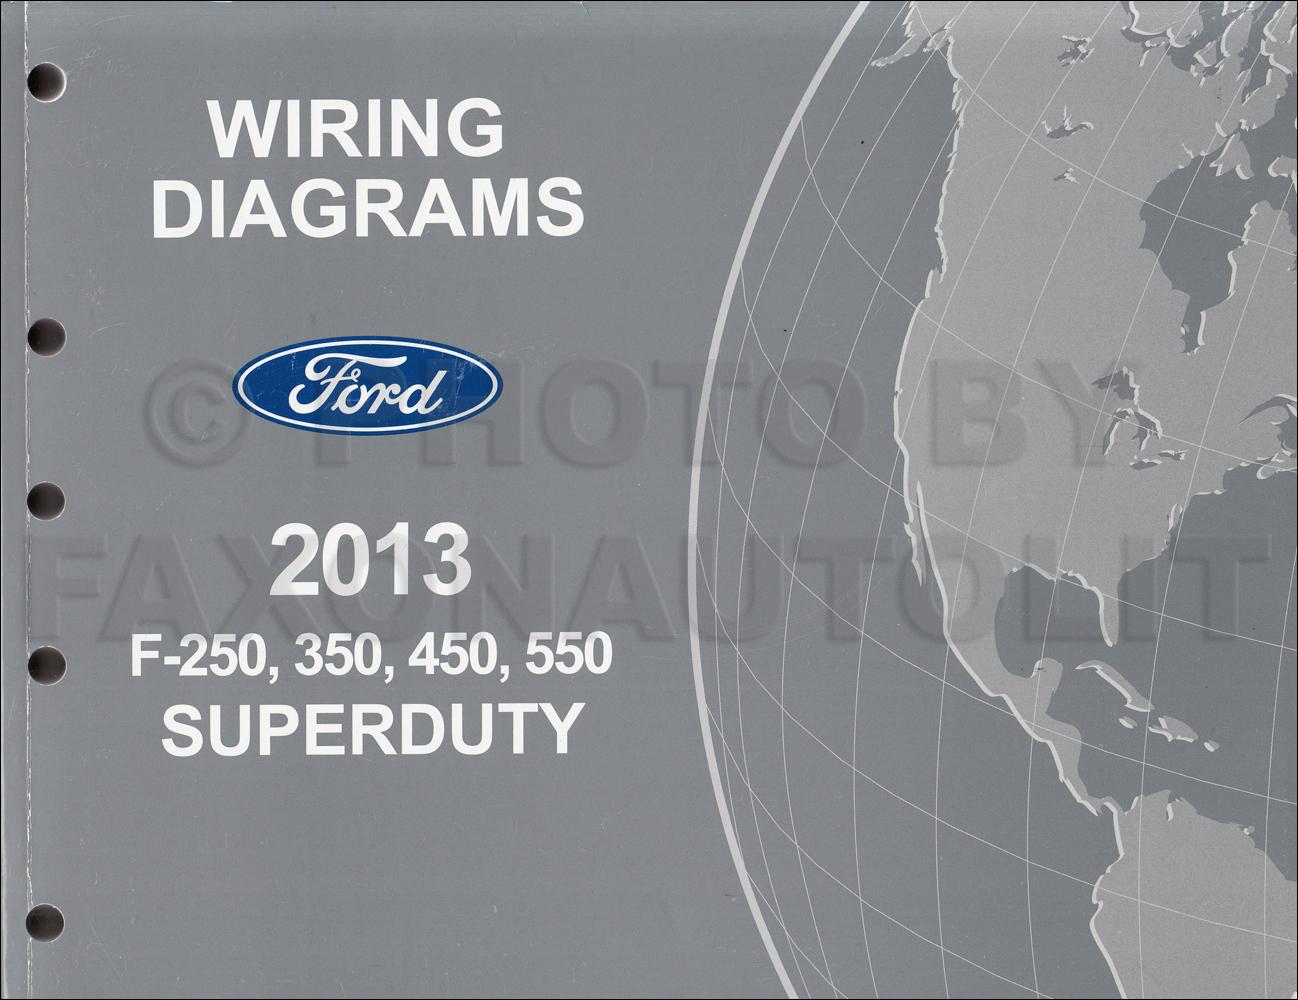 2013 Ford F250-F550 Super DutyTruck Wiring Diagram Manual